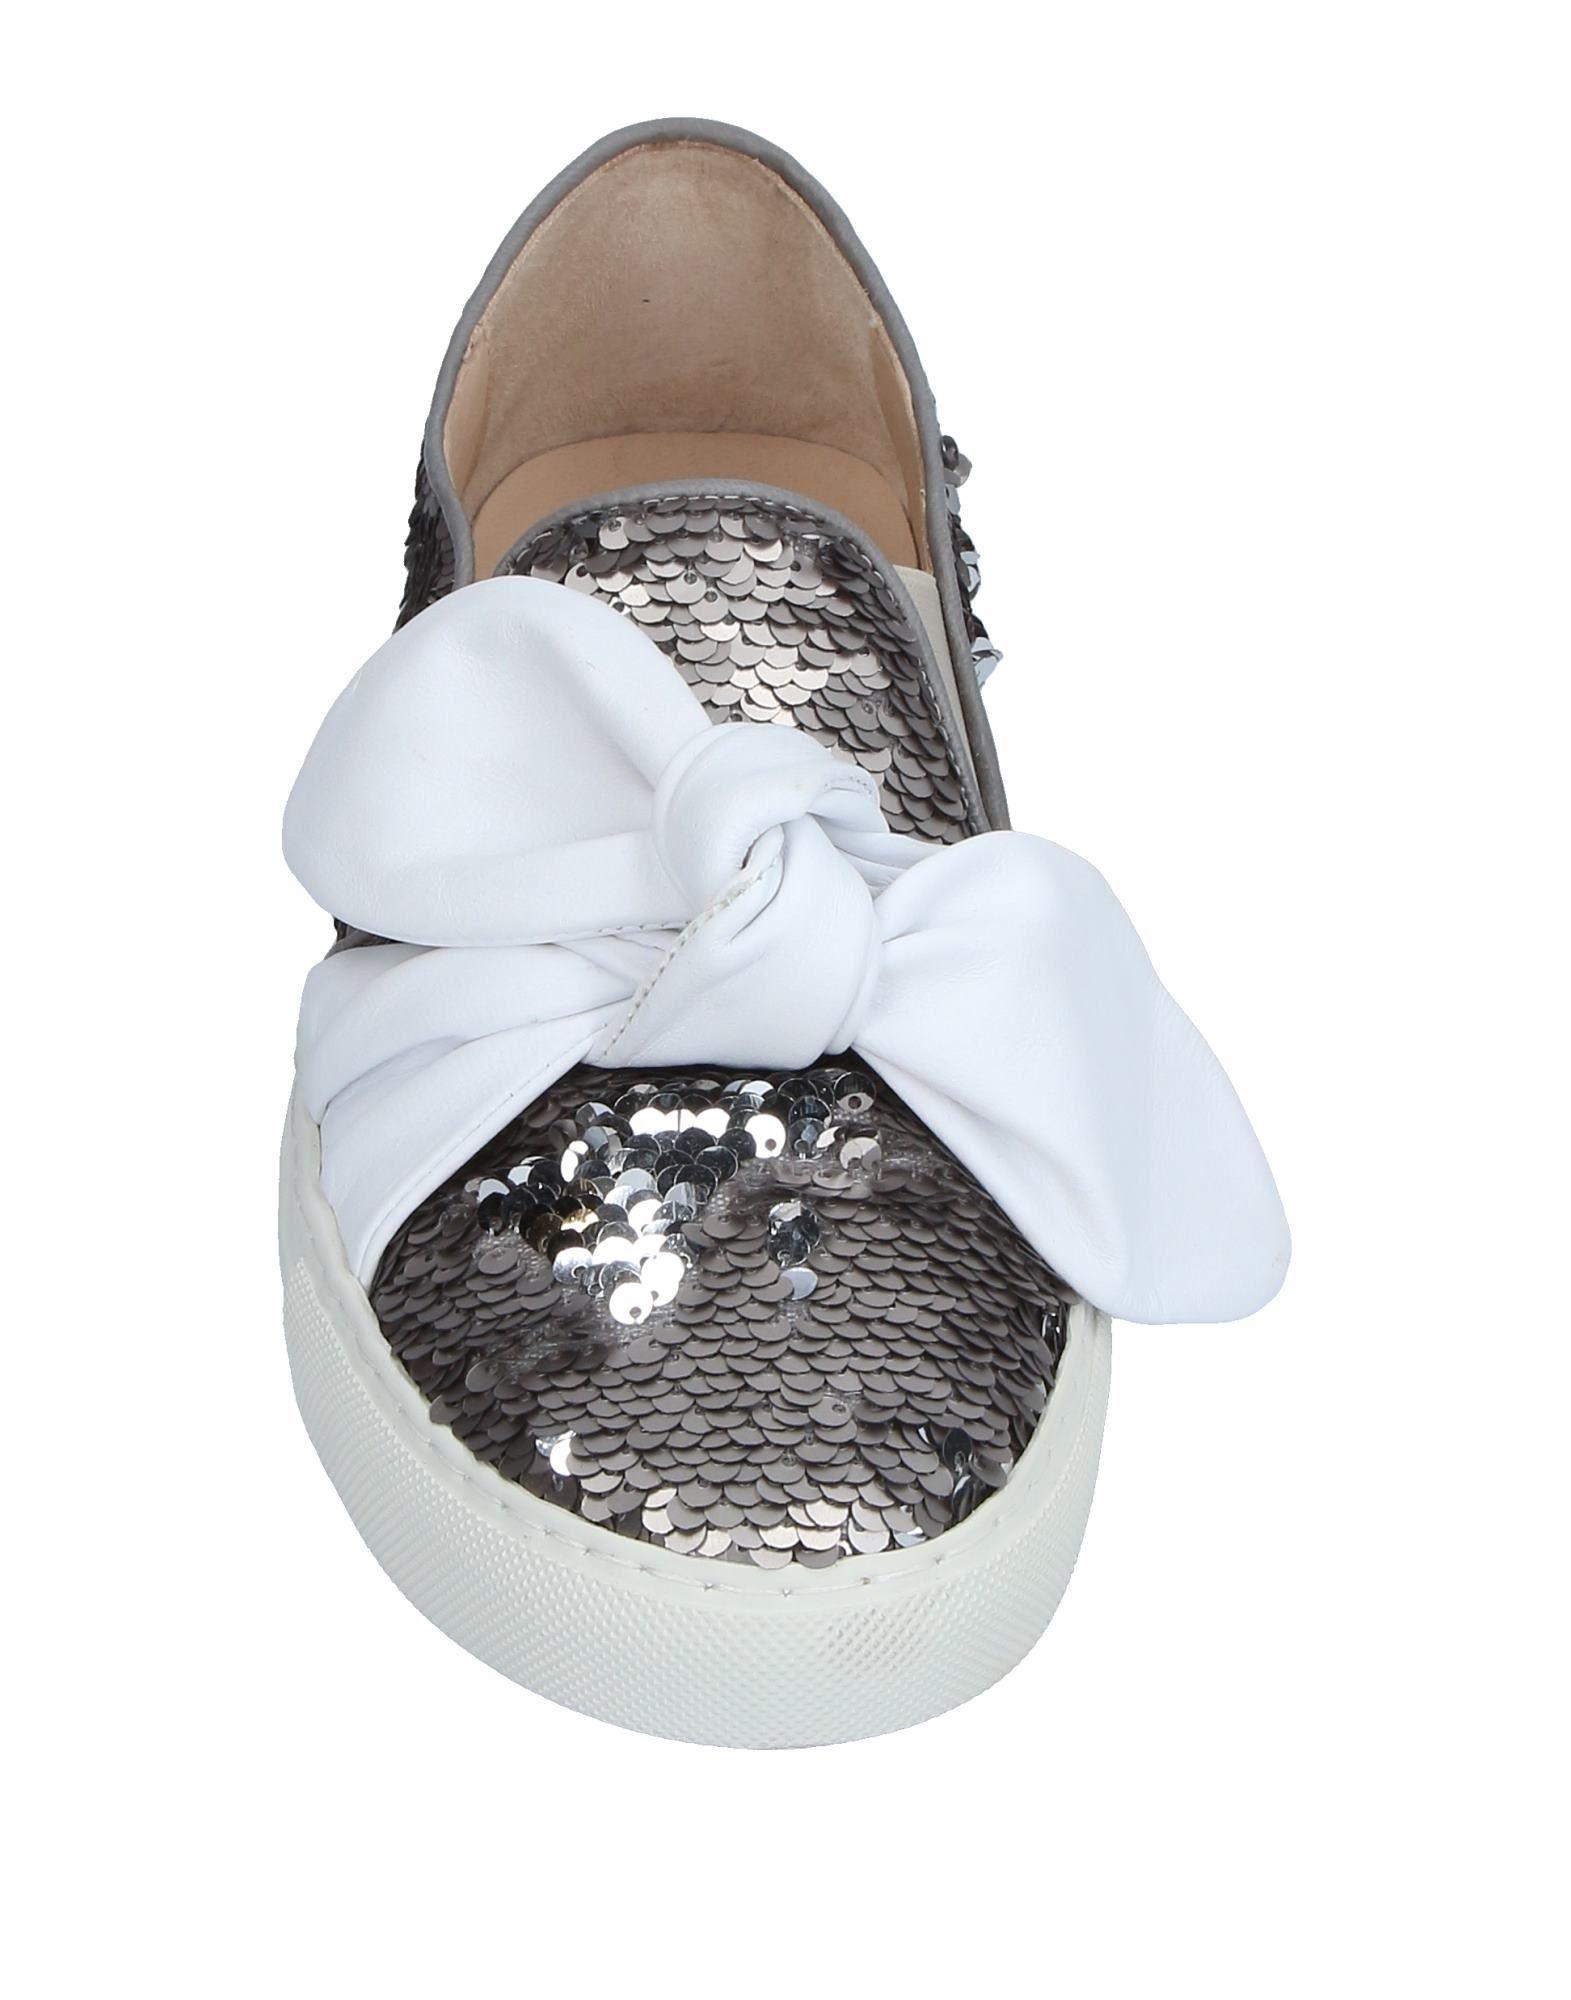 Stilvolle billige Schuhe Damen Ras Sneakers Damen Schuhe  11239363XE 98aaee